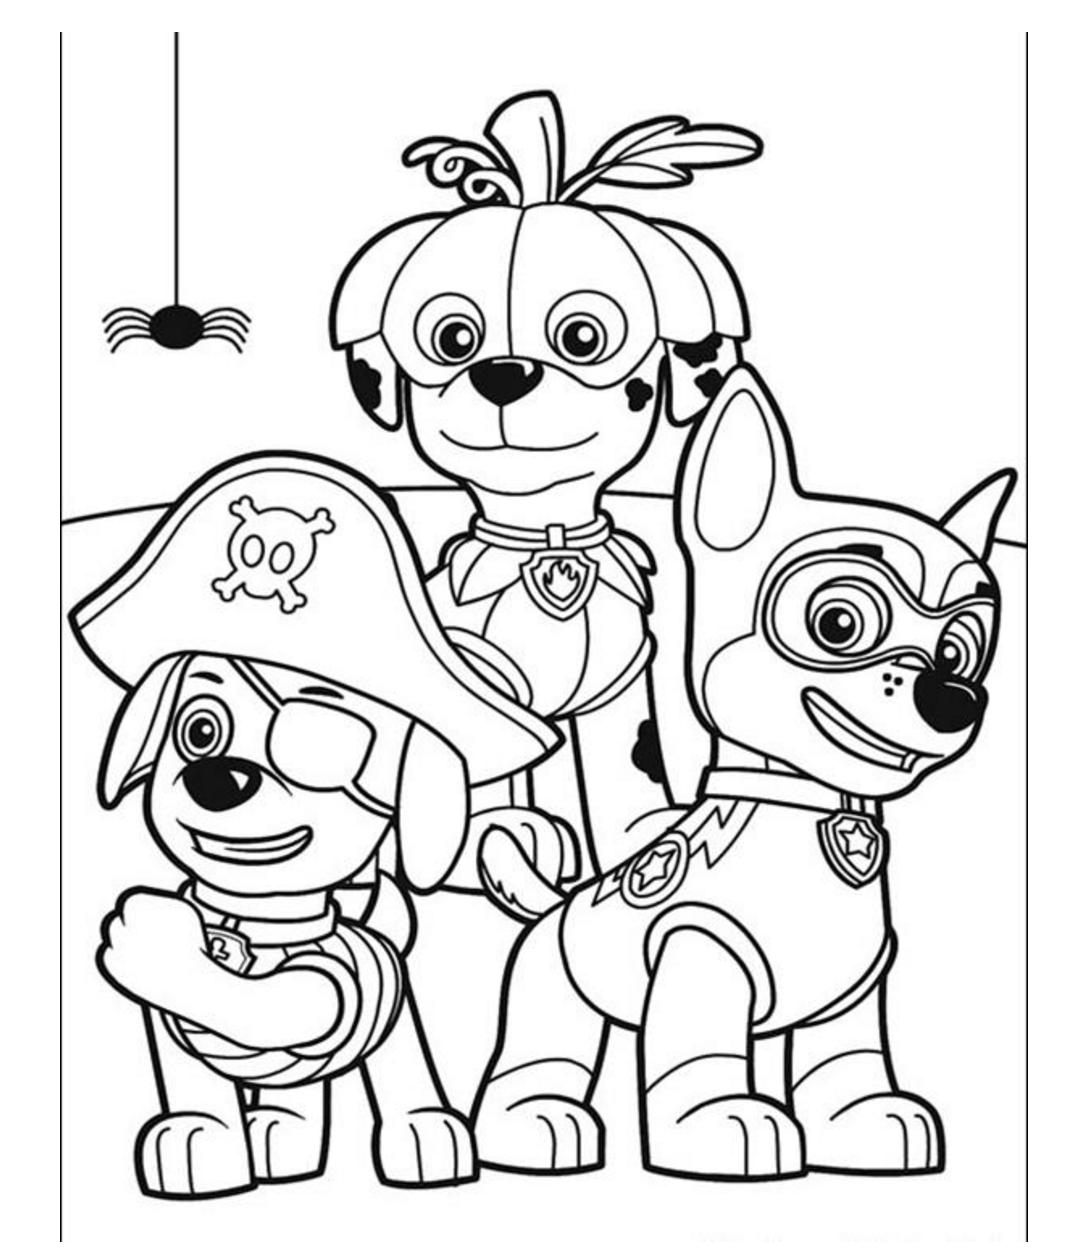 paw patrol coloring page paw patrol badges coloring page free printable coloring coloring page patrol paw